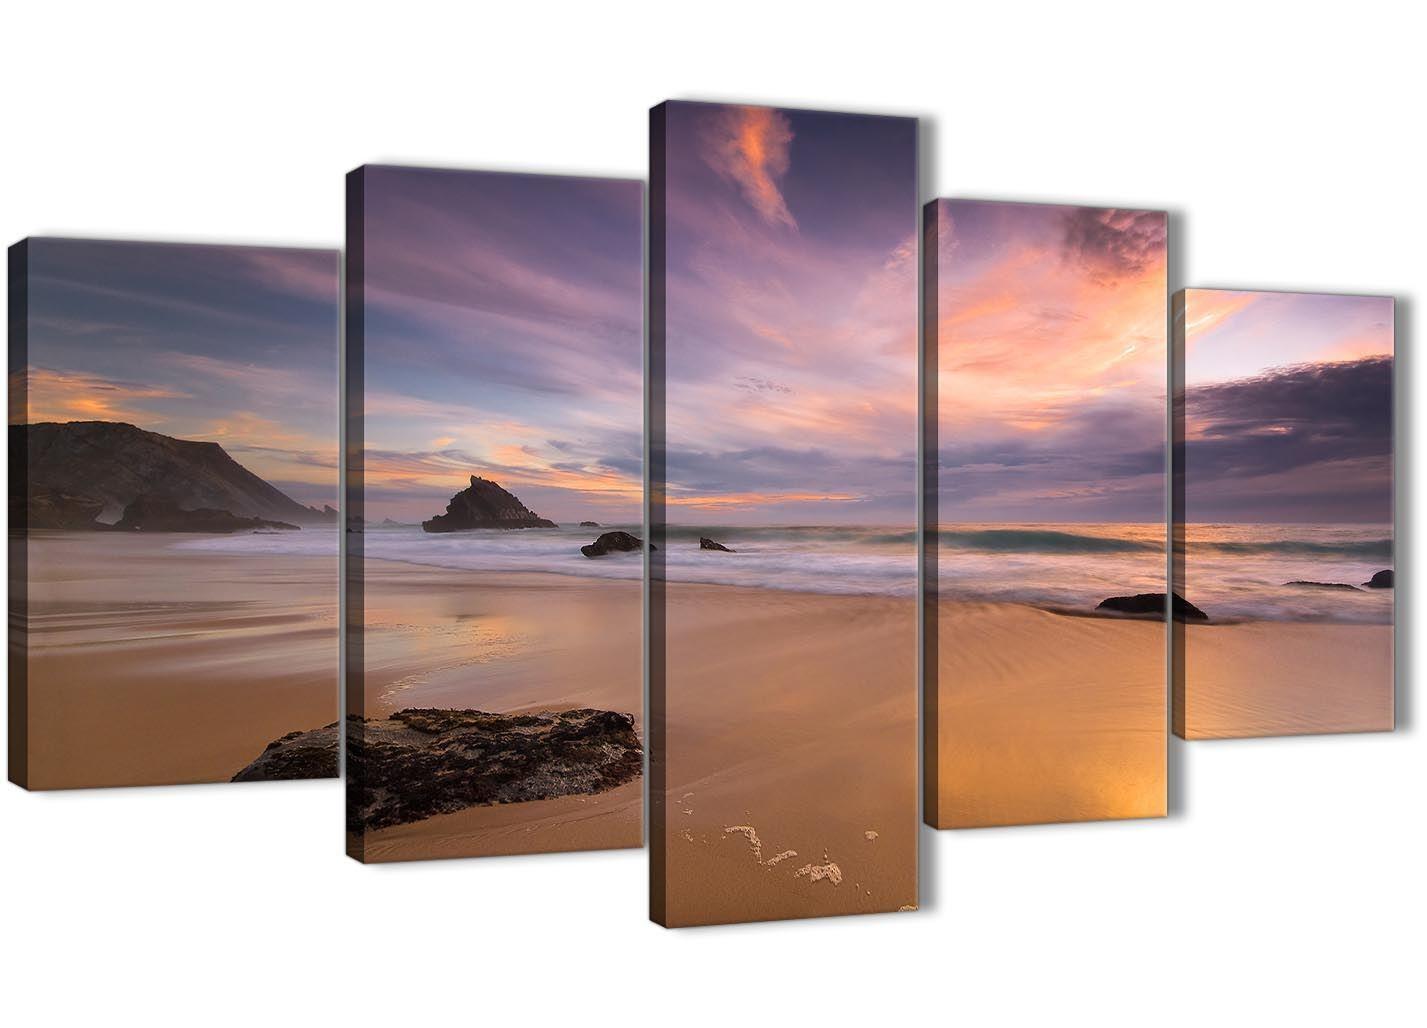 5 Part Canvas Pictures - Panoramic Landscape Beach Sunset - 5198 - 160cm